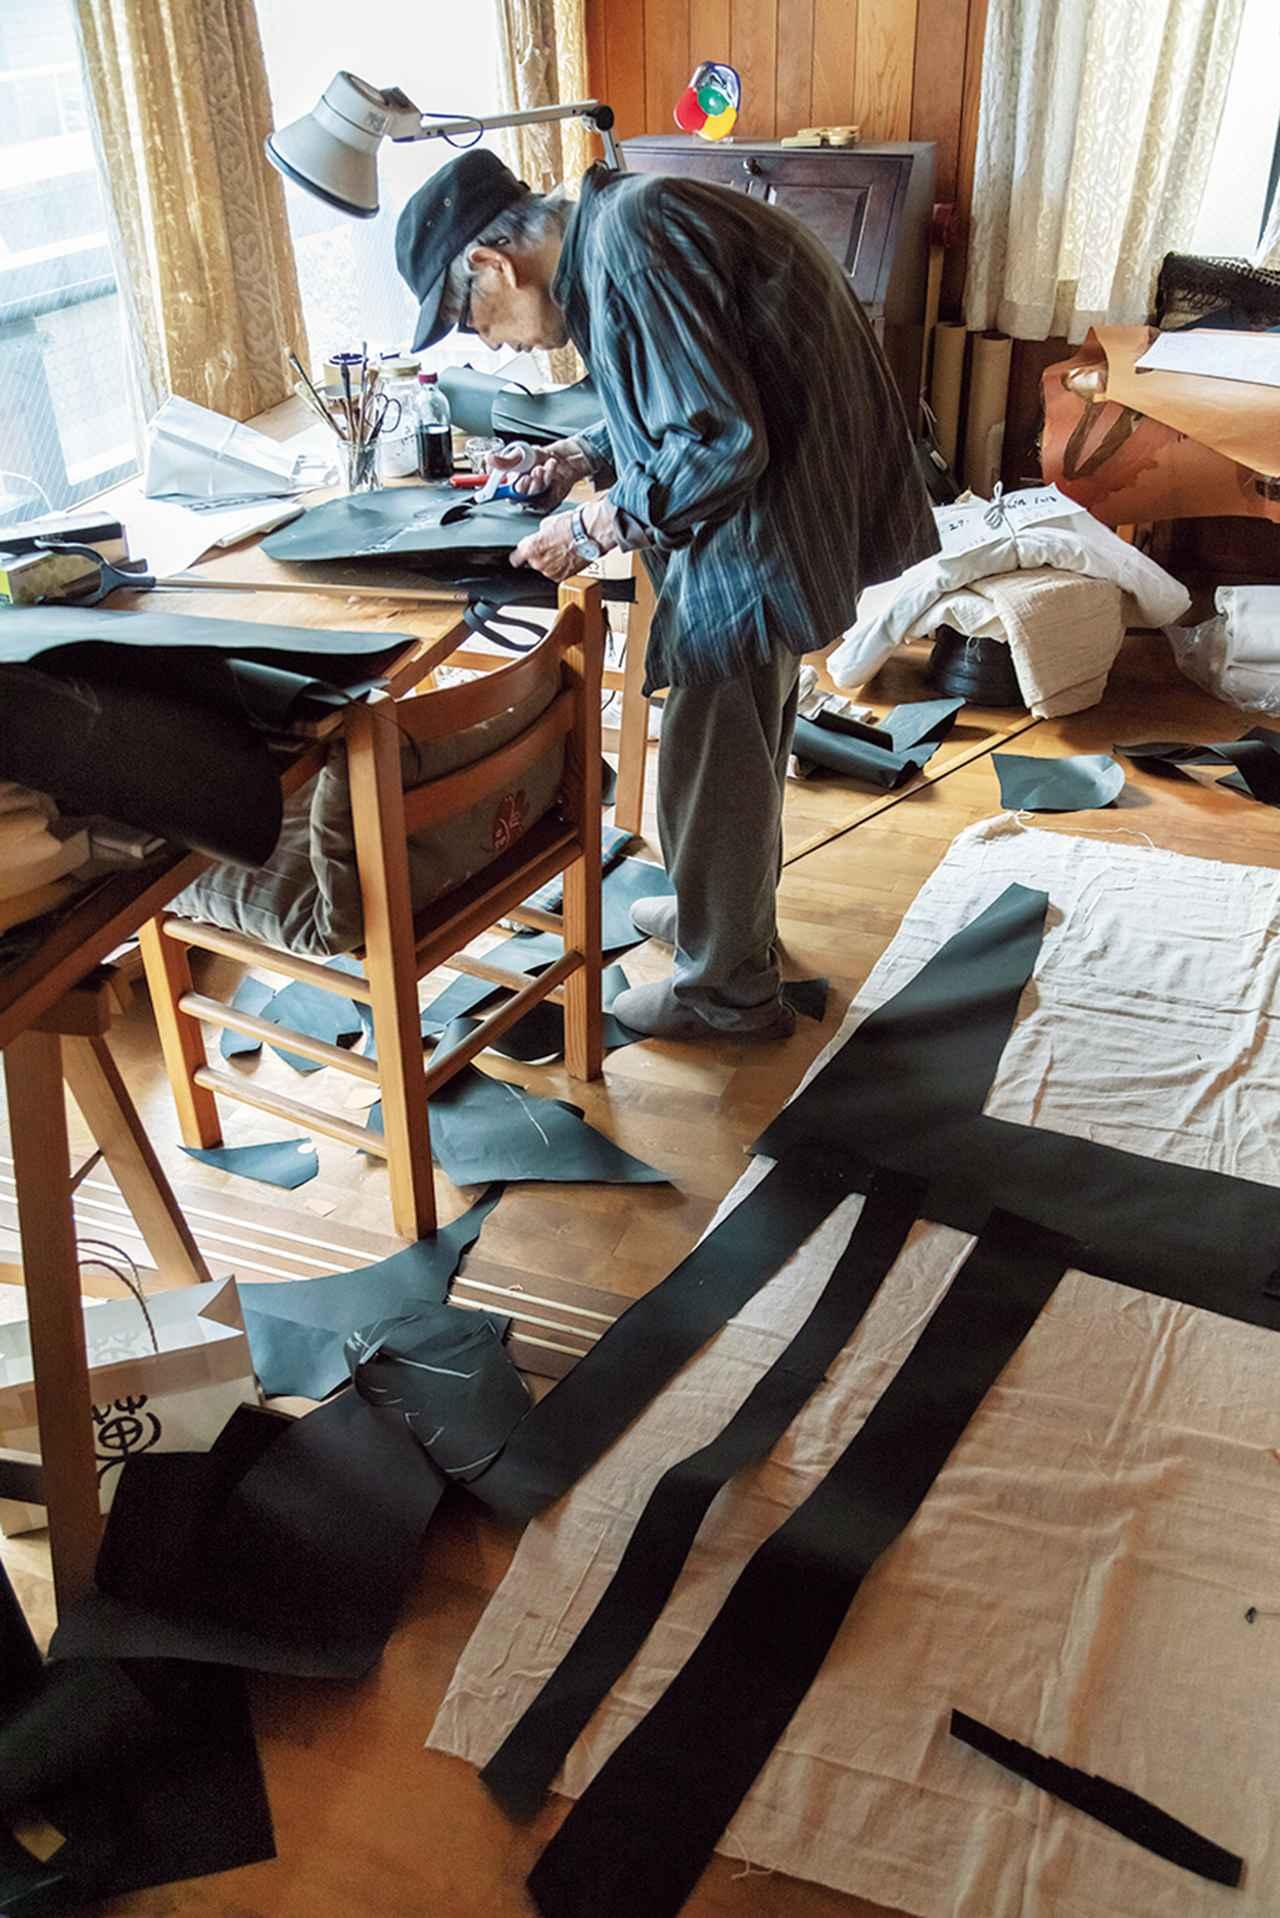 Images : 3番目の画像 - 「染色家、柚木沙弥郎 96歳の進行形」のアルバム - T JAPAN:The New York Times Style Magazine 公式サイト